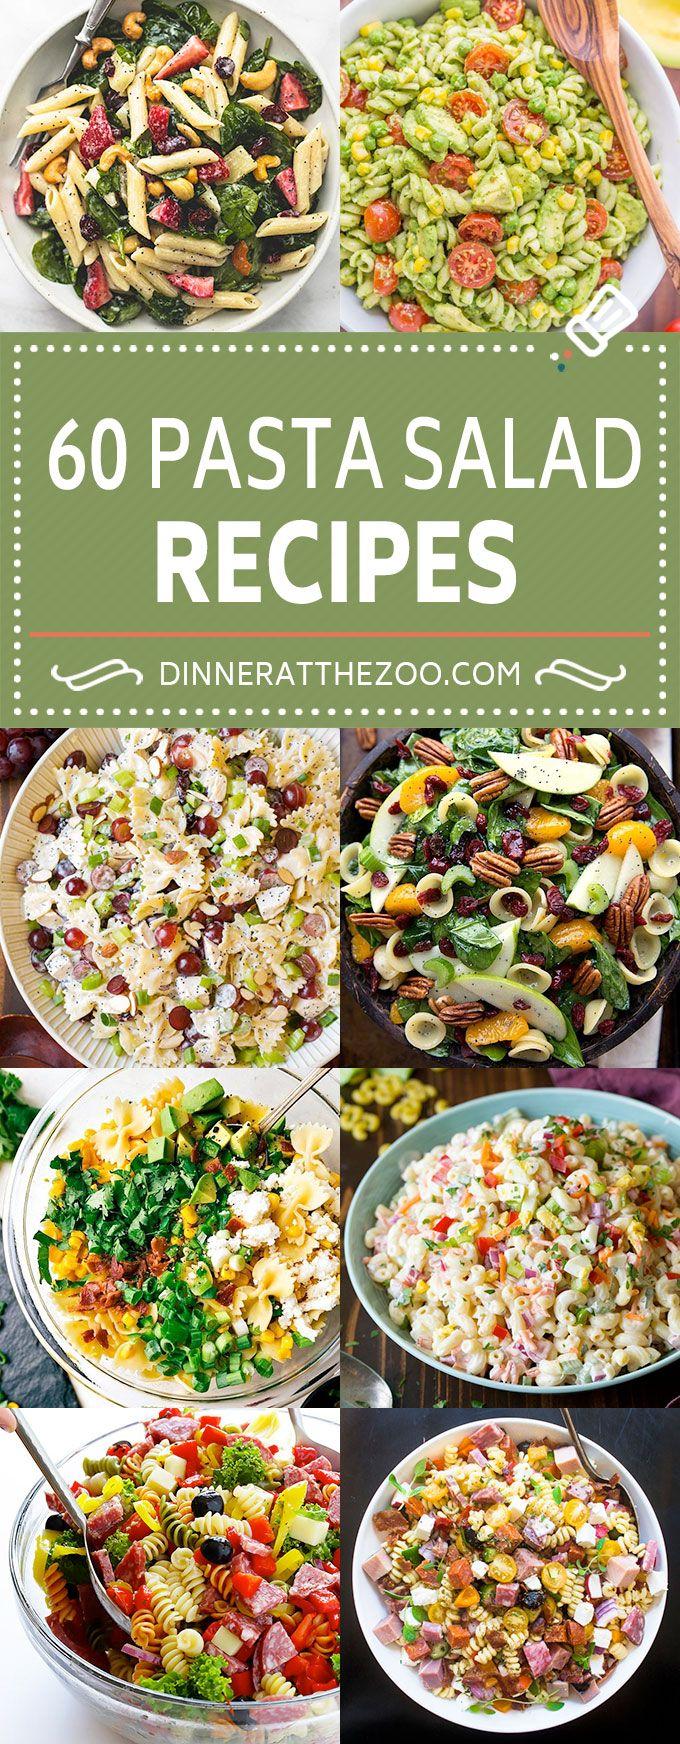 60 Pasta Salad Recipes | Easy Pasta Salad | Macaroni Salad | Summer Salads